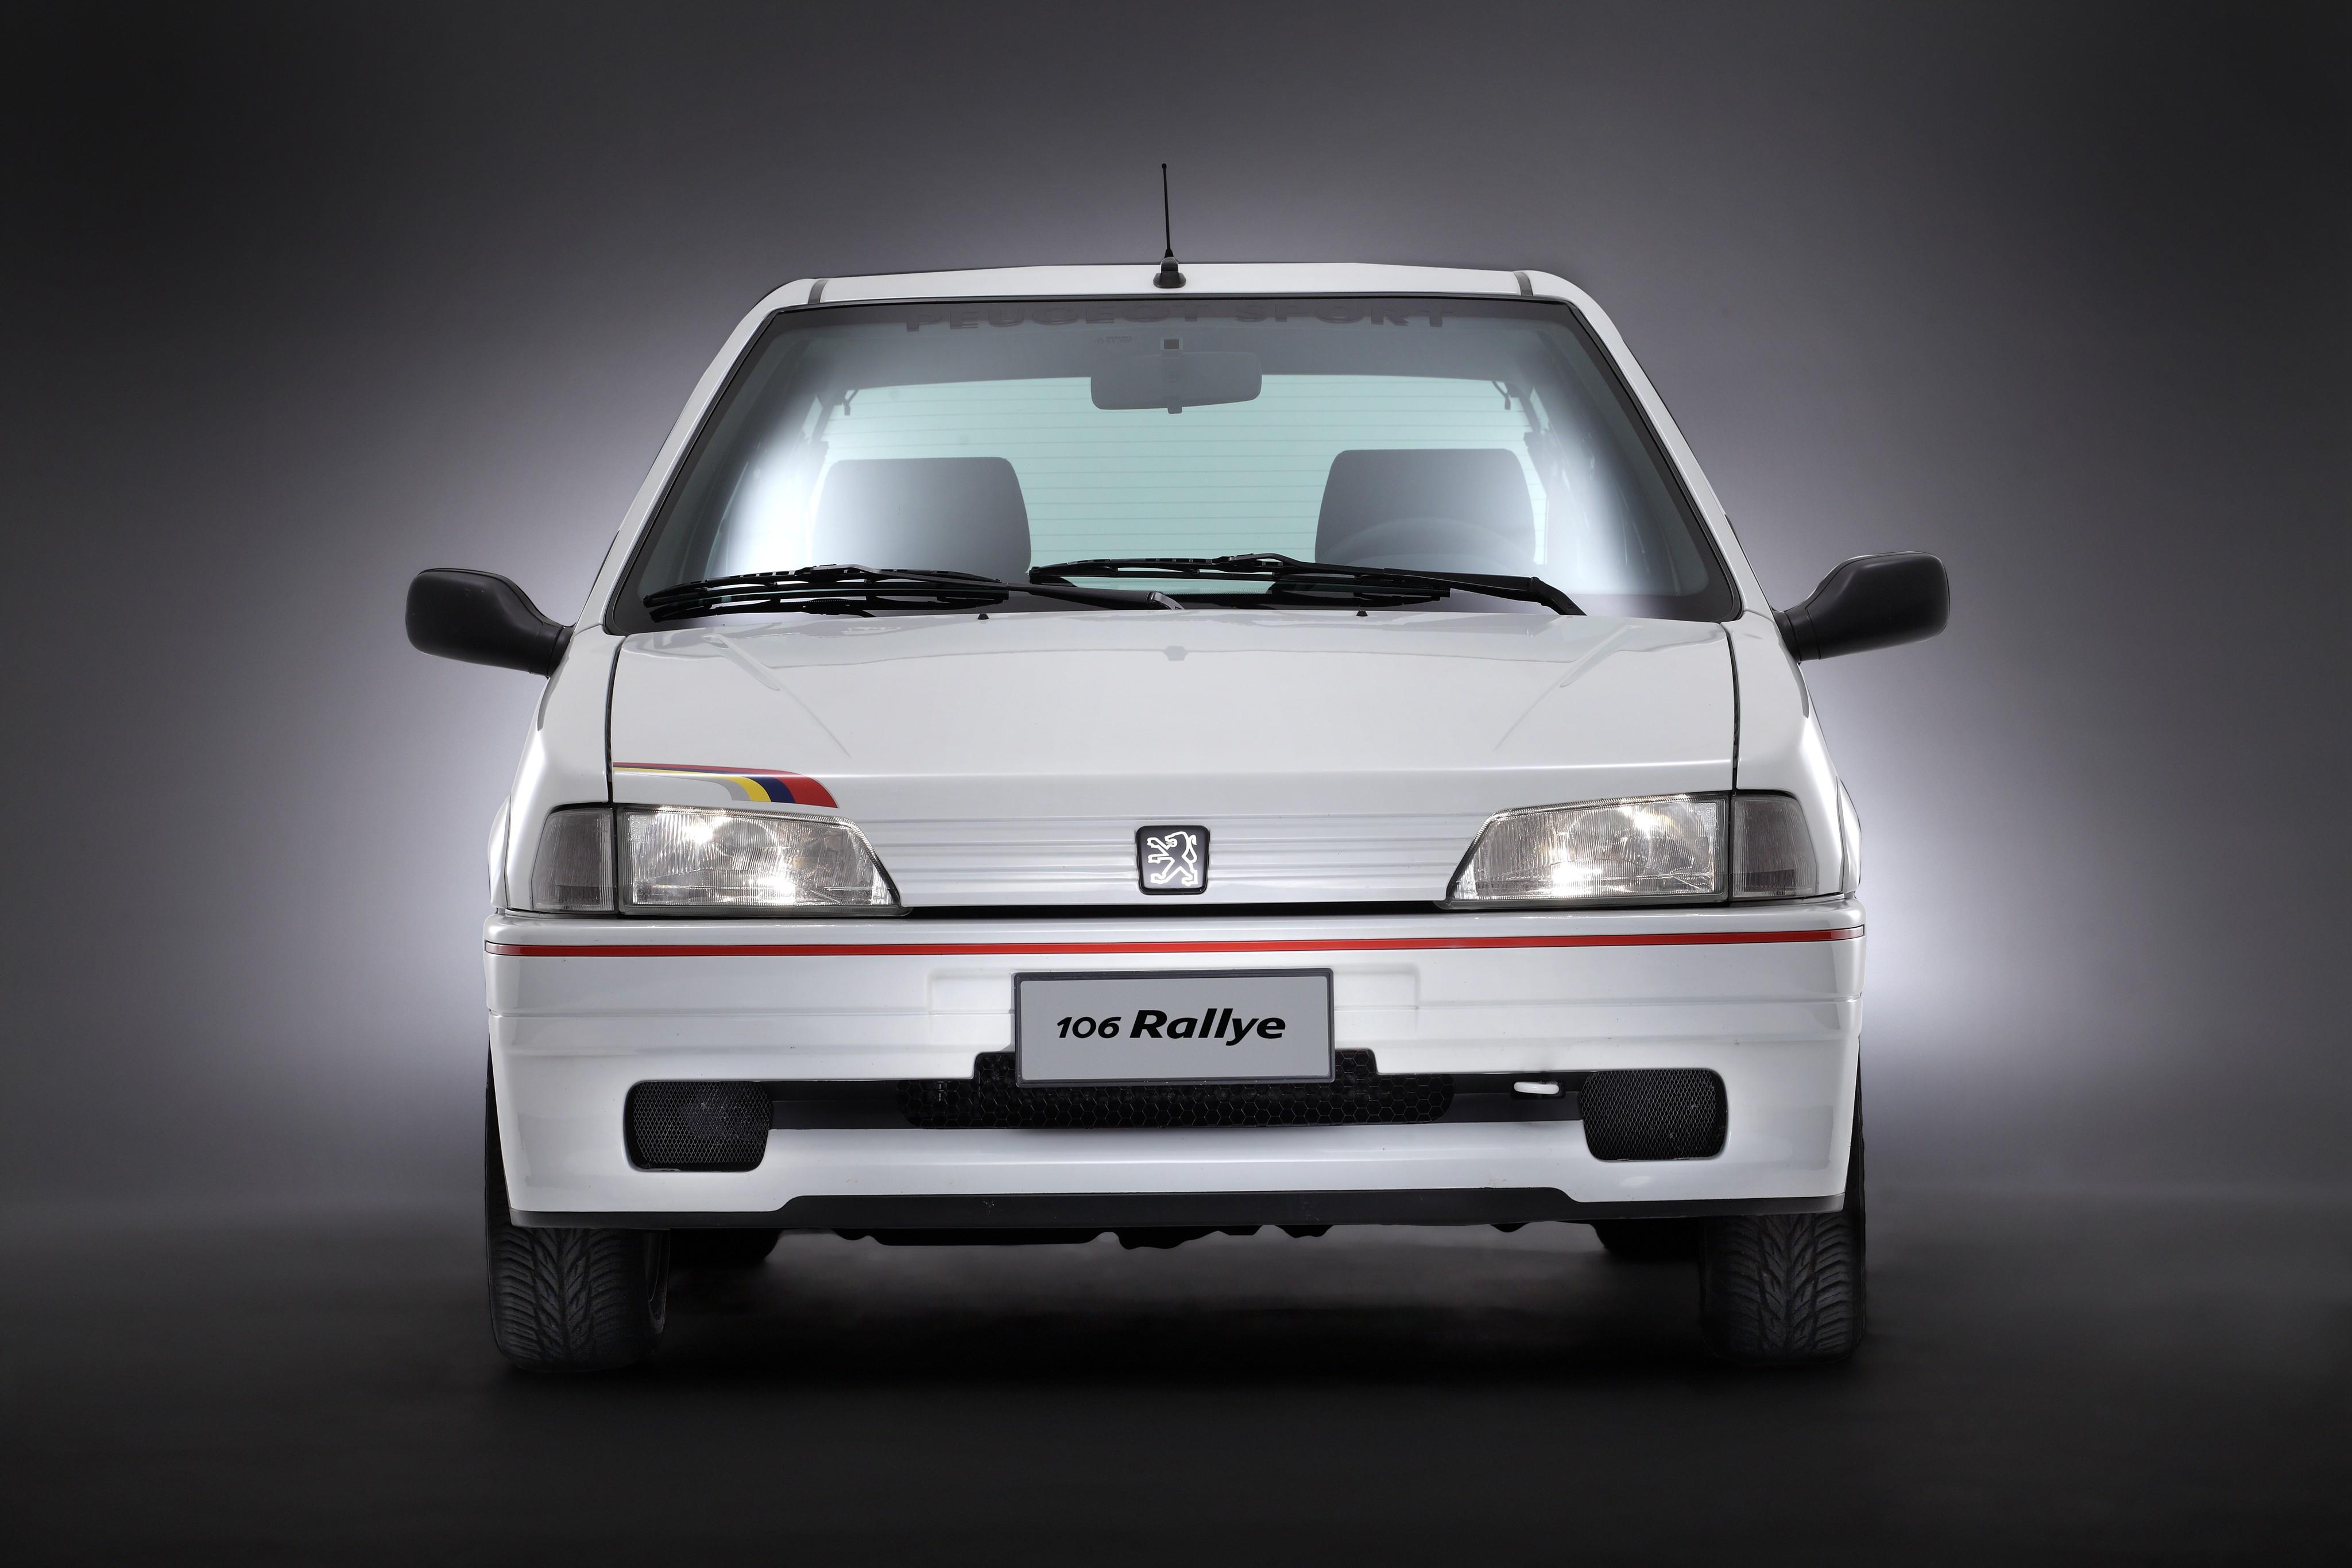 Peugeot 106 Rallye 1993 1994 1995 1996 Autoevolution